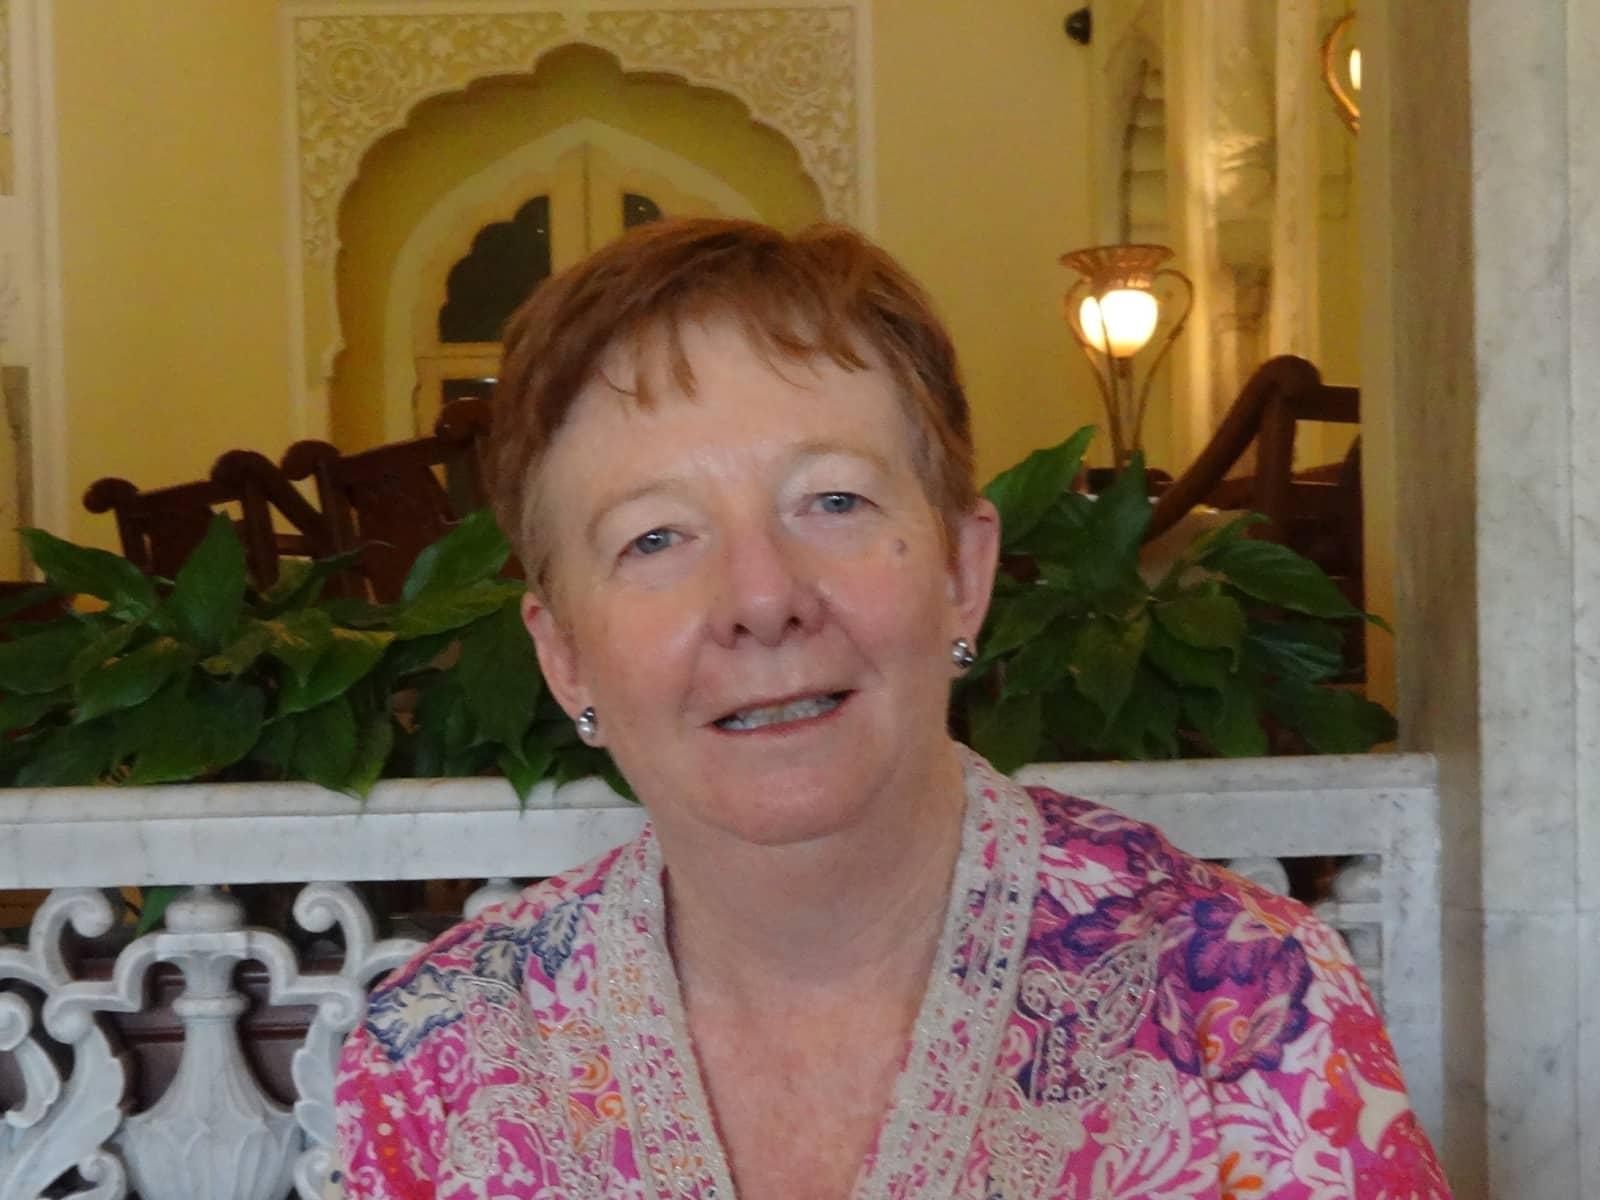 Catherine from Brisbane, Queensland, Australia